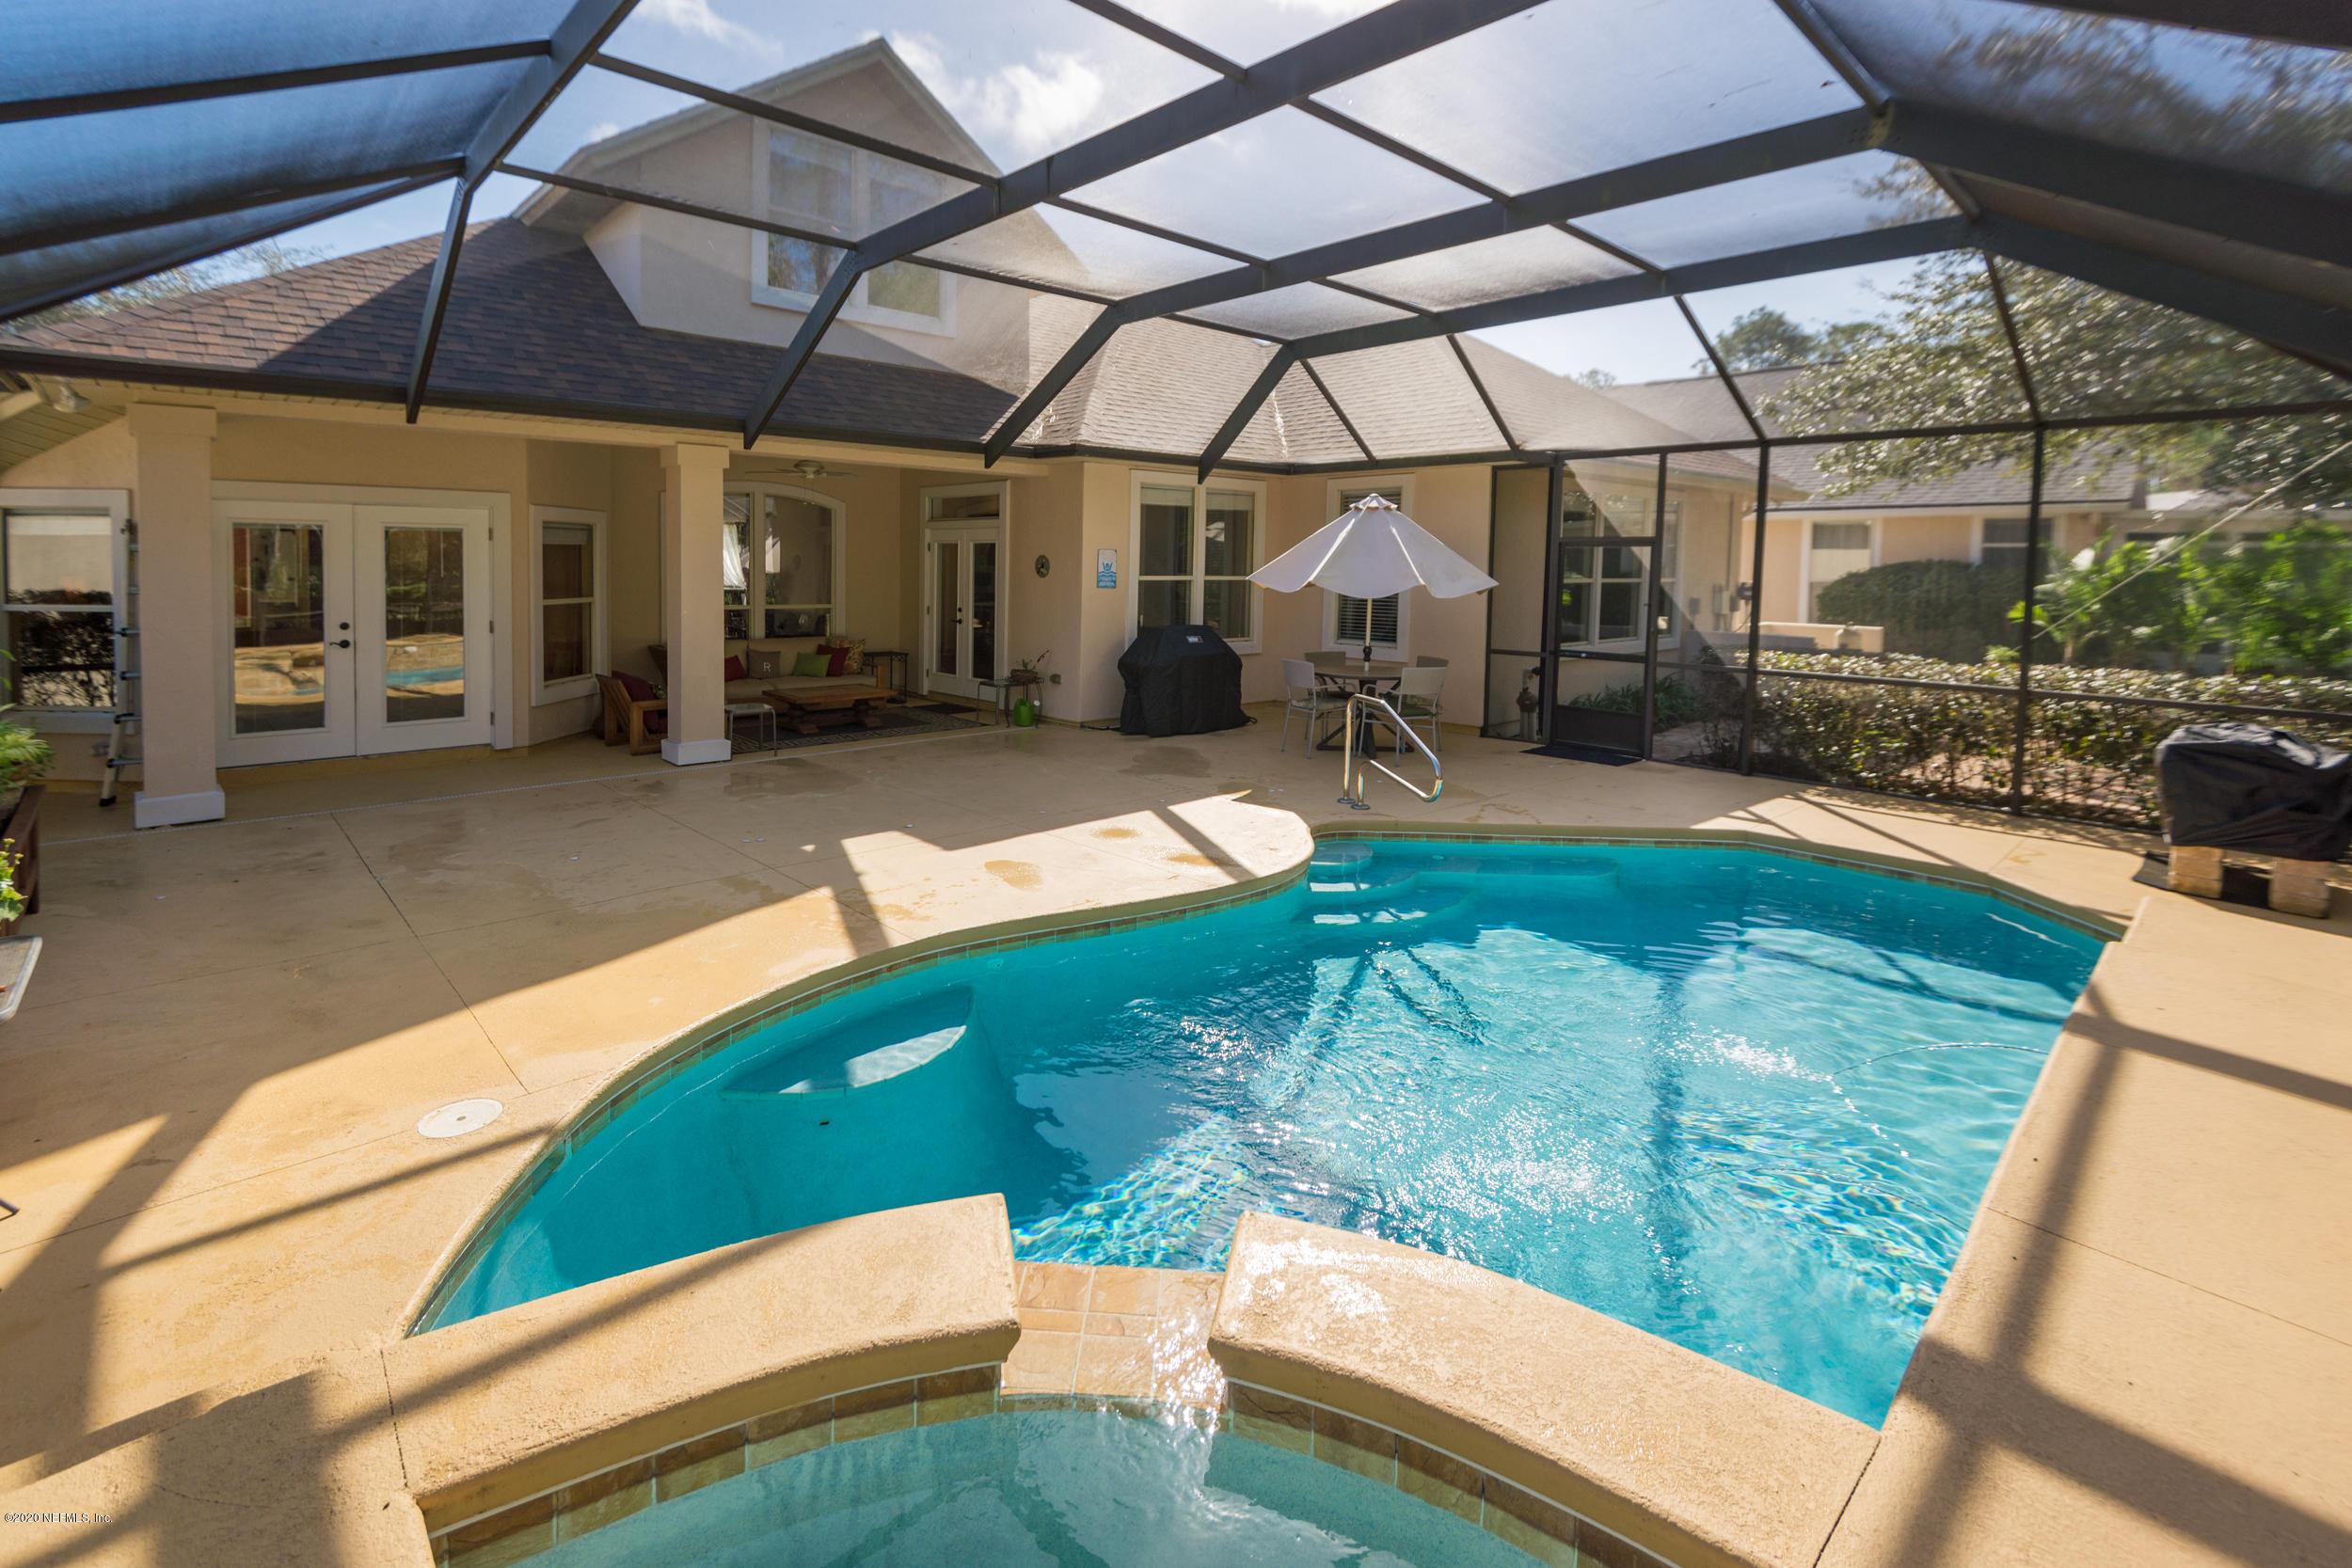 3761 BERENSTAIN, ST AUGUSTINE, FLORIDA 32092, 4 Bedrooms Bedrooms, ,3 BathroomsBathrooms,For sale,BERENSTAIN,1033847